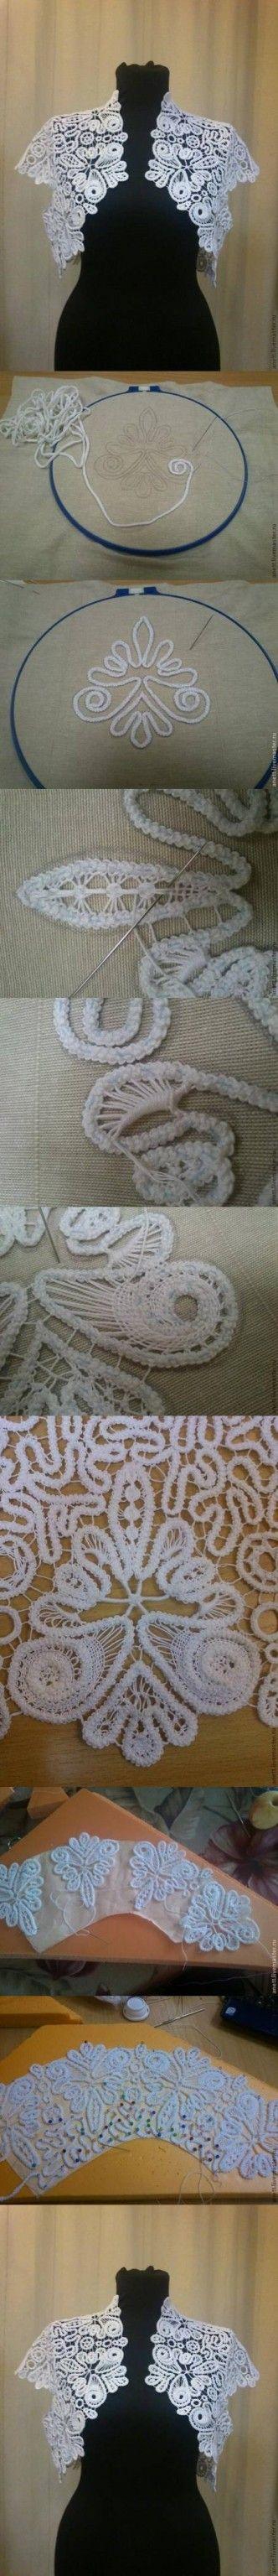 DIY Romanian Lace DIY Projects